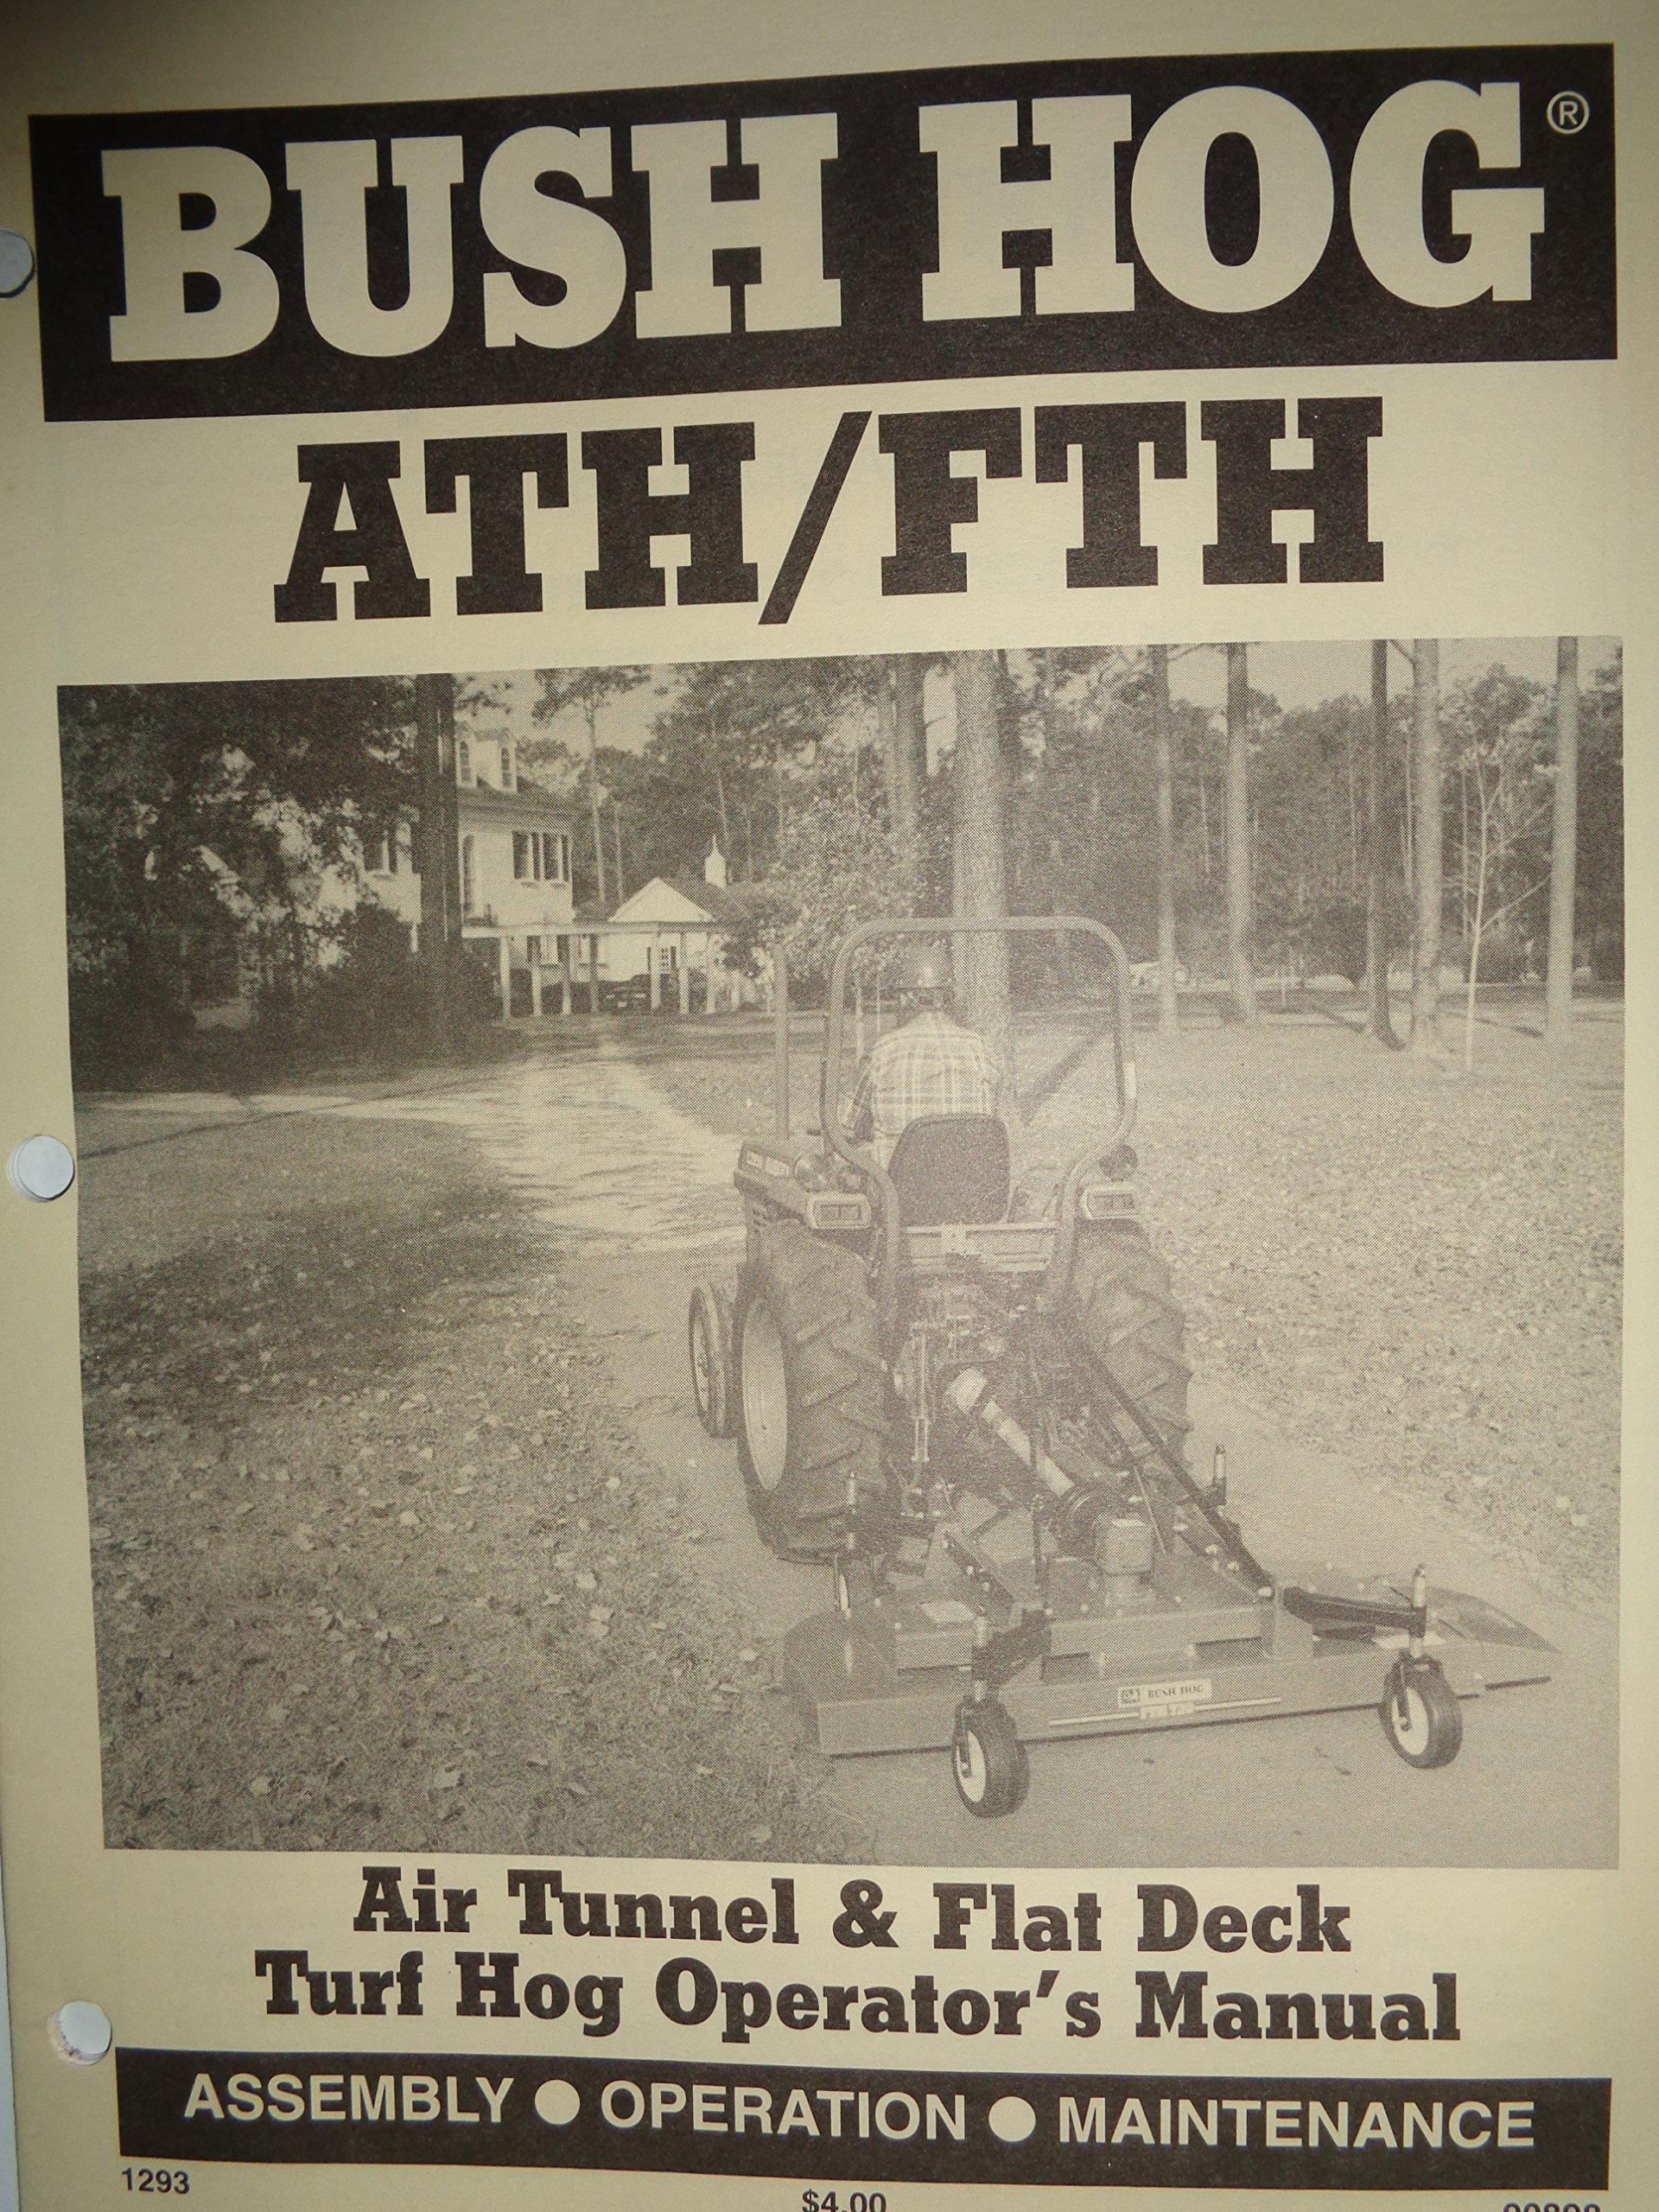 Bush Hog ATH/FTH 480 600 720 Rotary Cutter Mower Operators